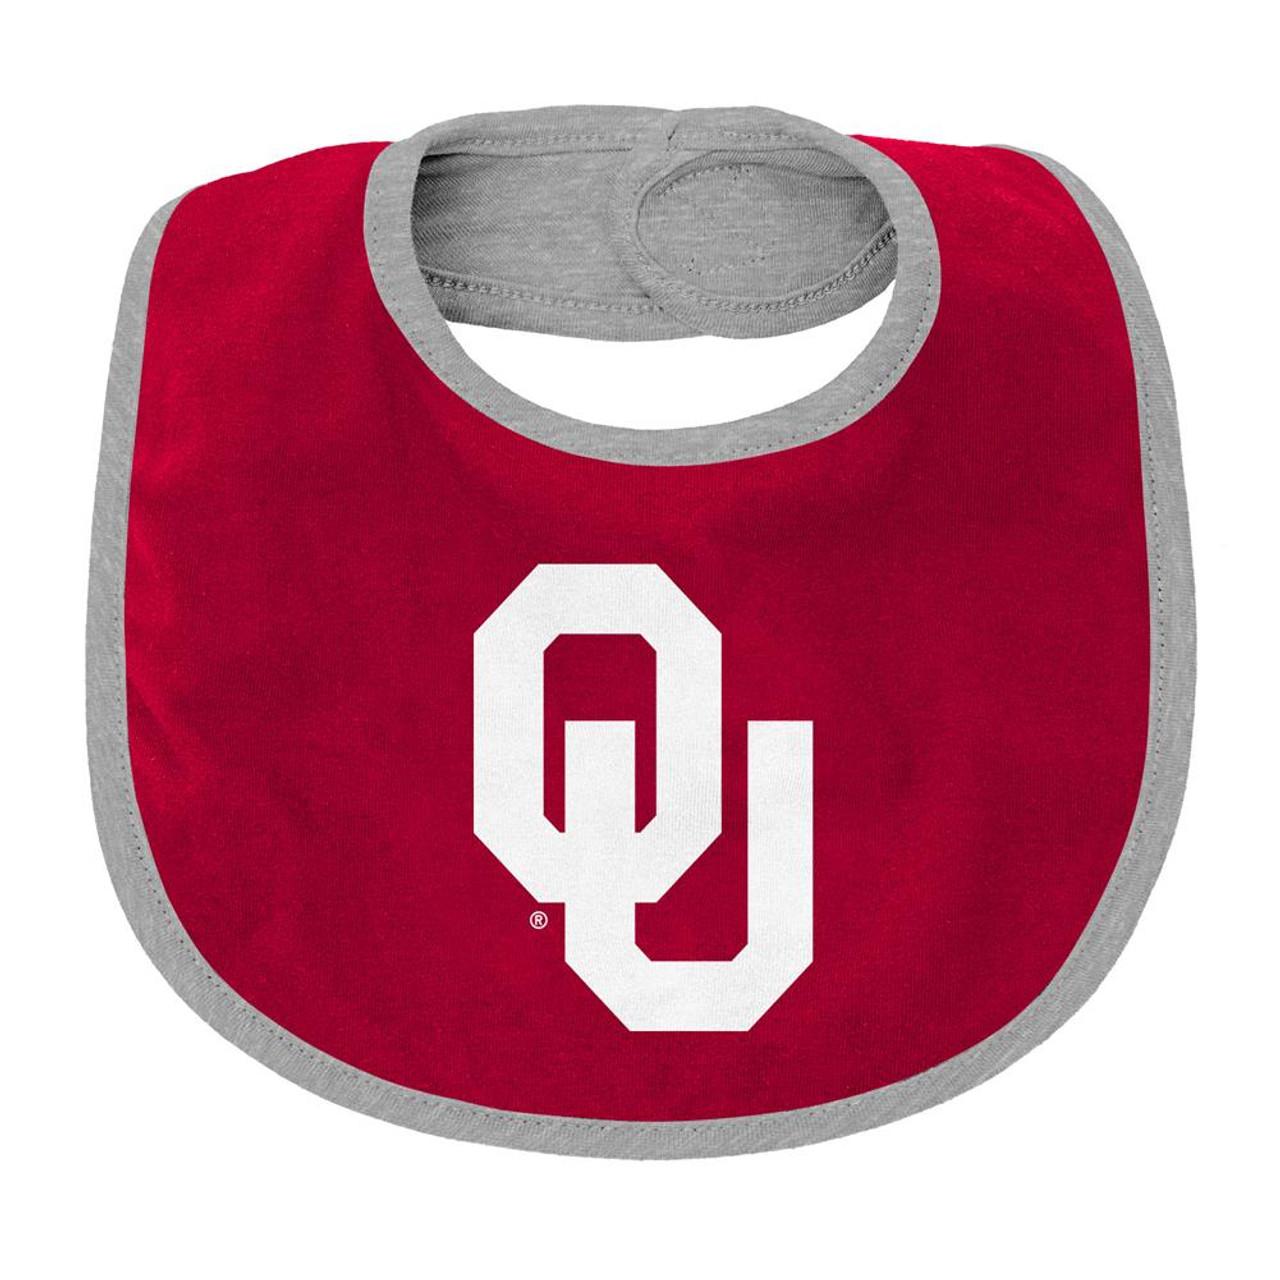 University of Oklahoma Sooners Creeper, Bib and Bootie Set Infant Set